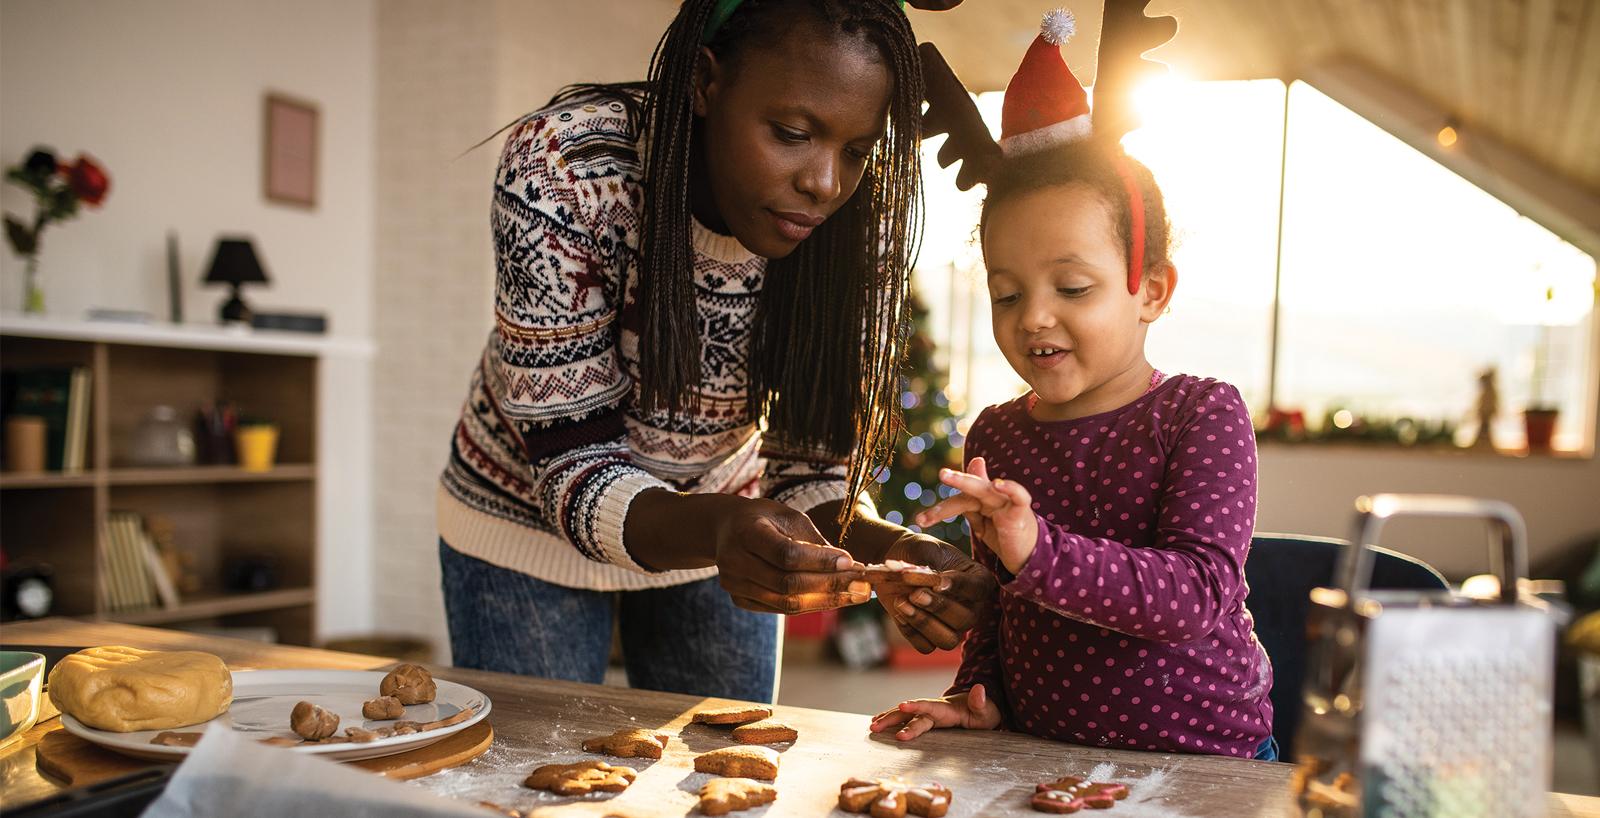 Children's Centre family fun – November to December